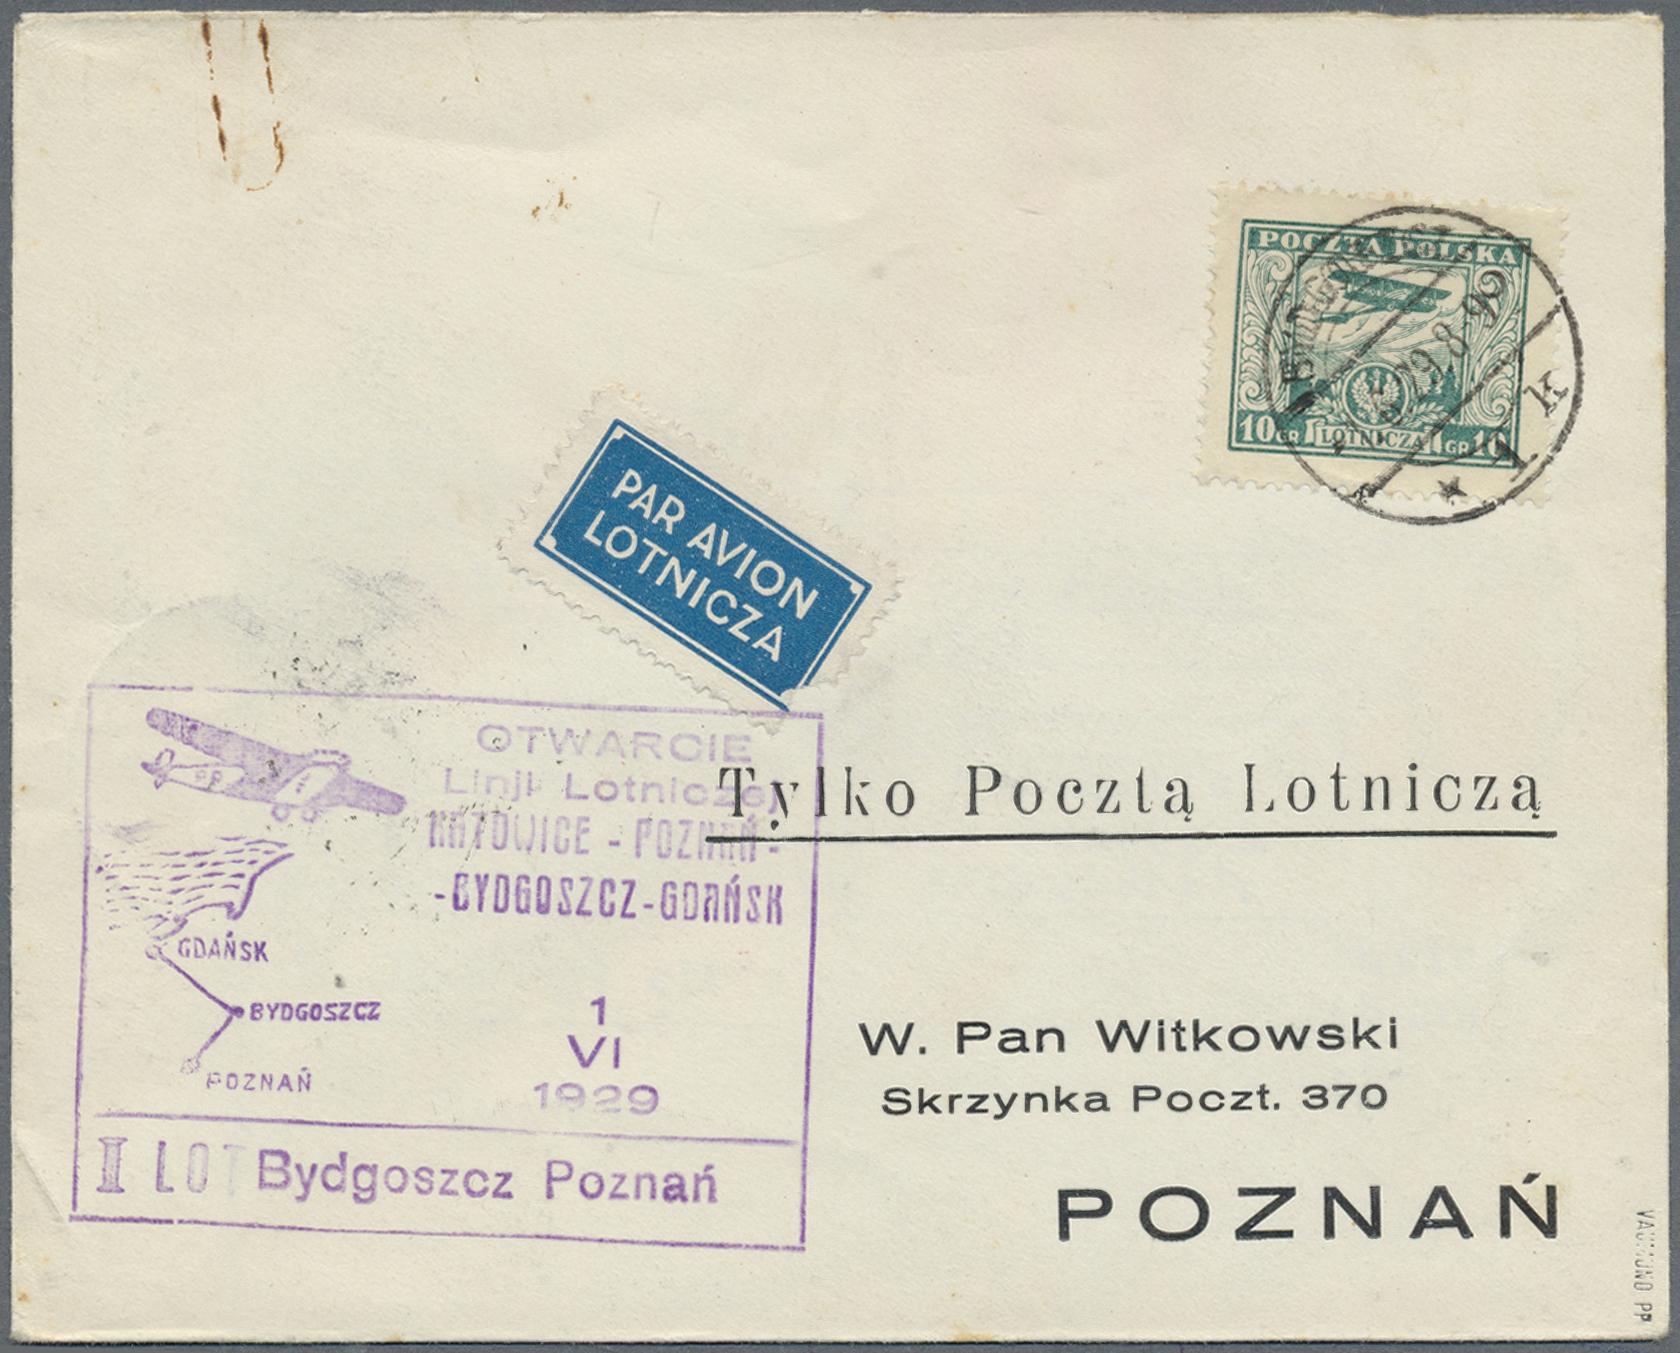 krieg in polen 1939